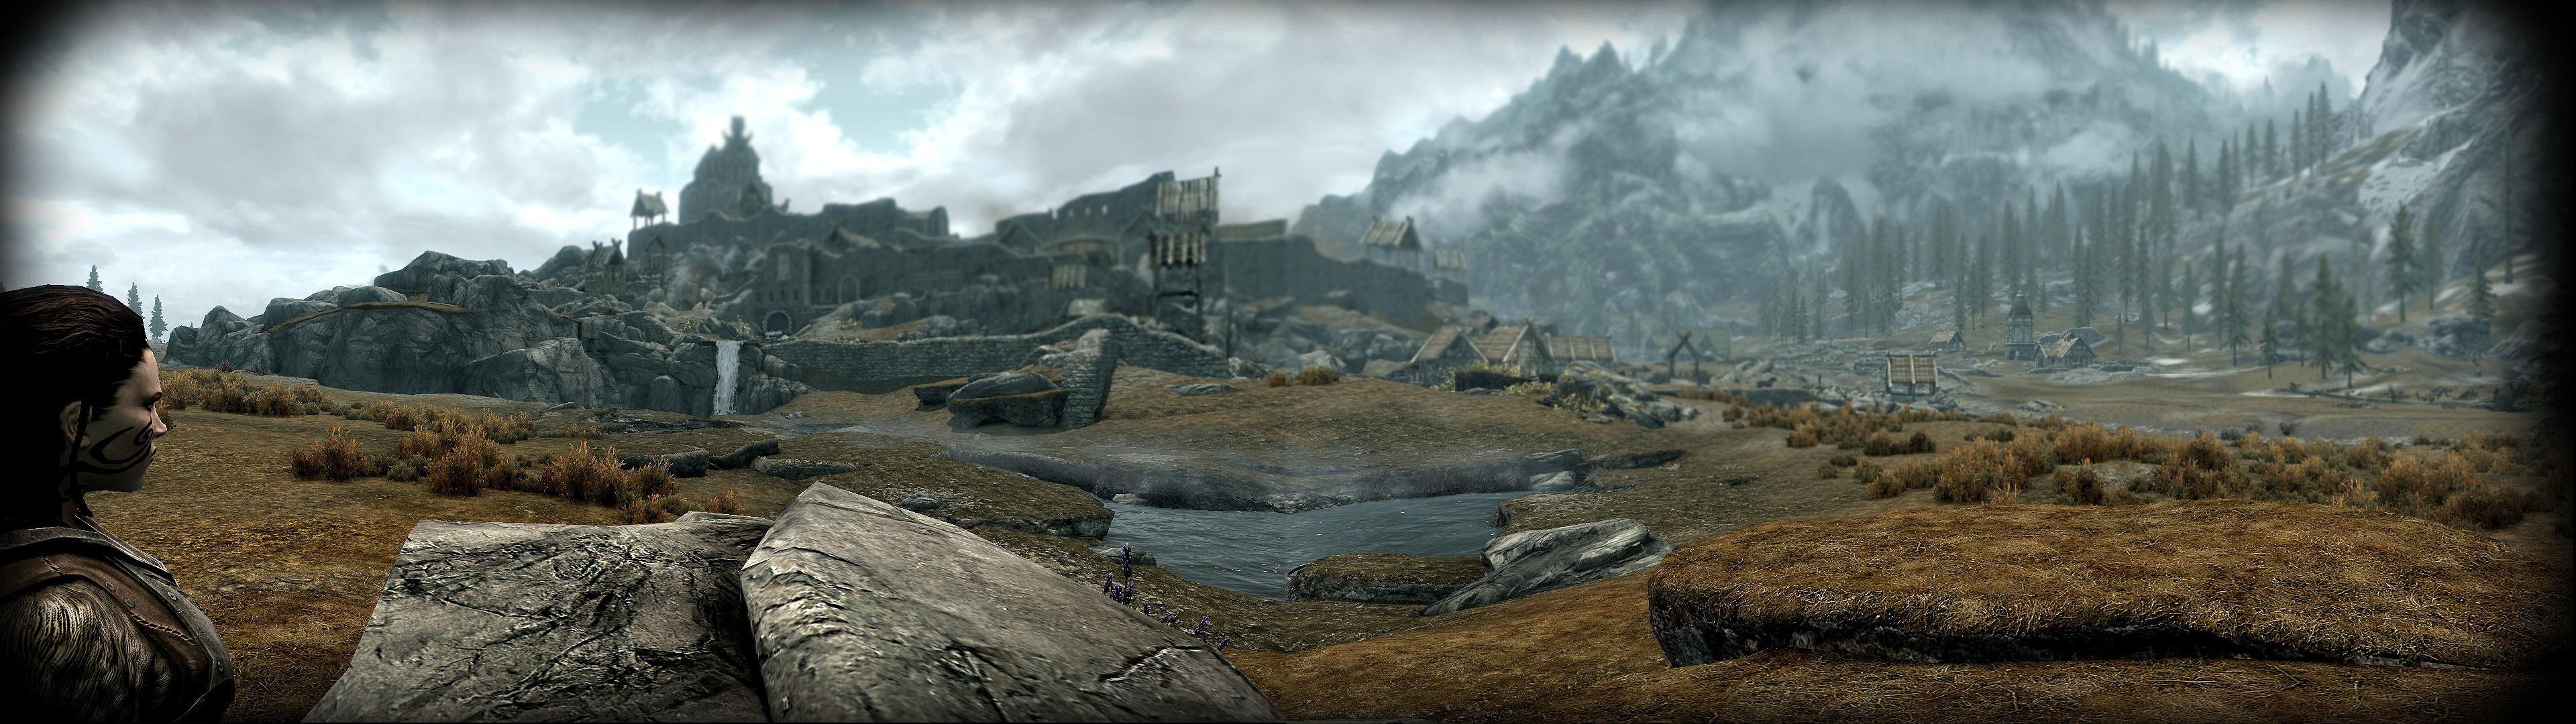 Fallout 4 Dual Screen Wallpaper (56+ images)